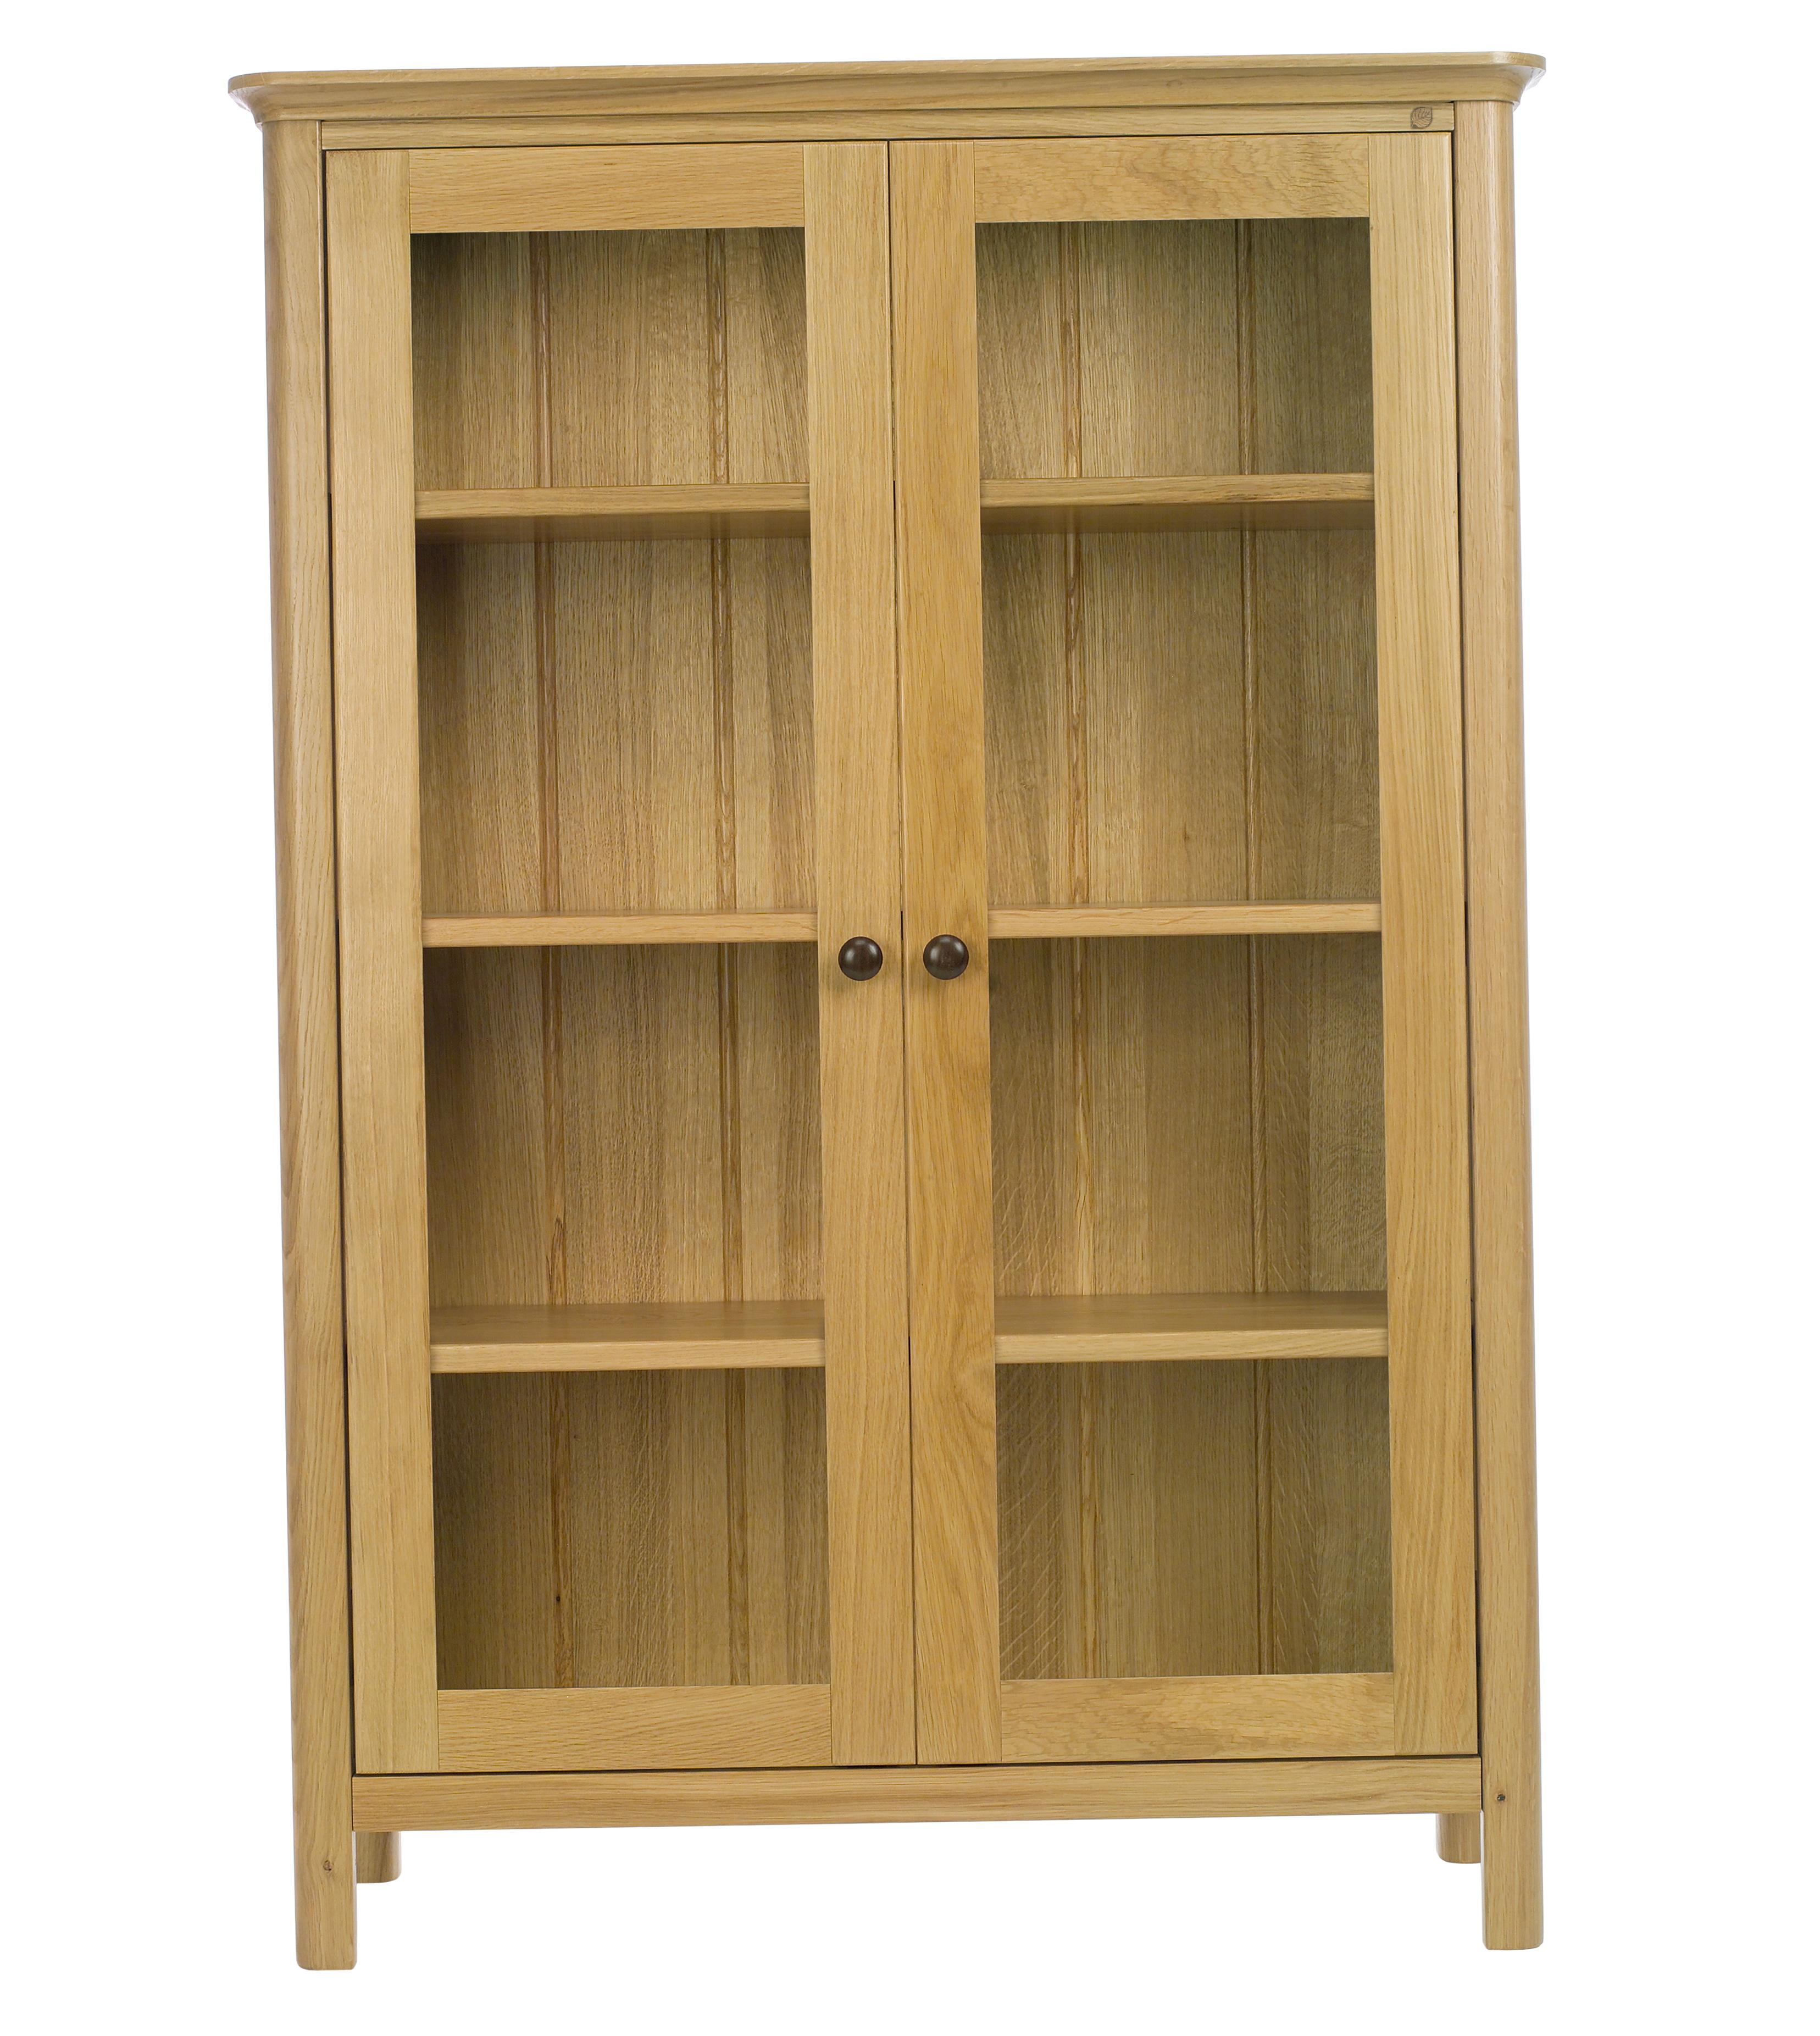 4 Shelf Bookcase With Doors